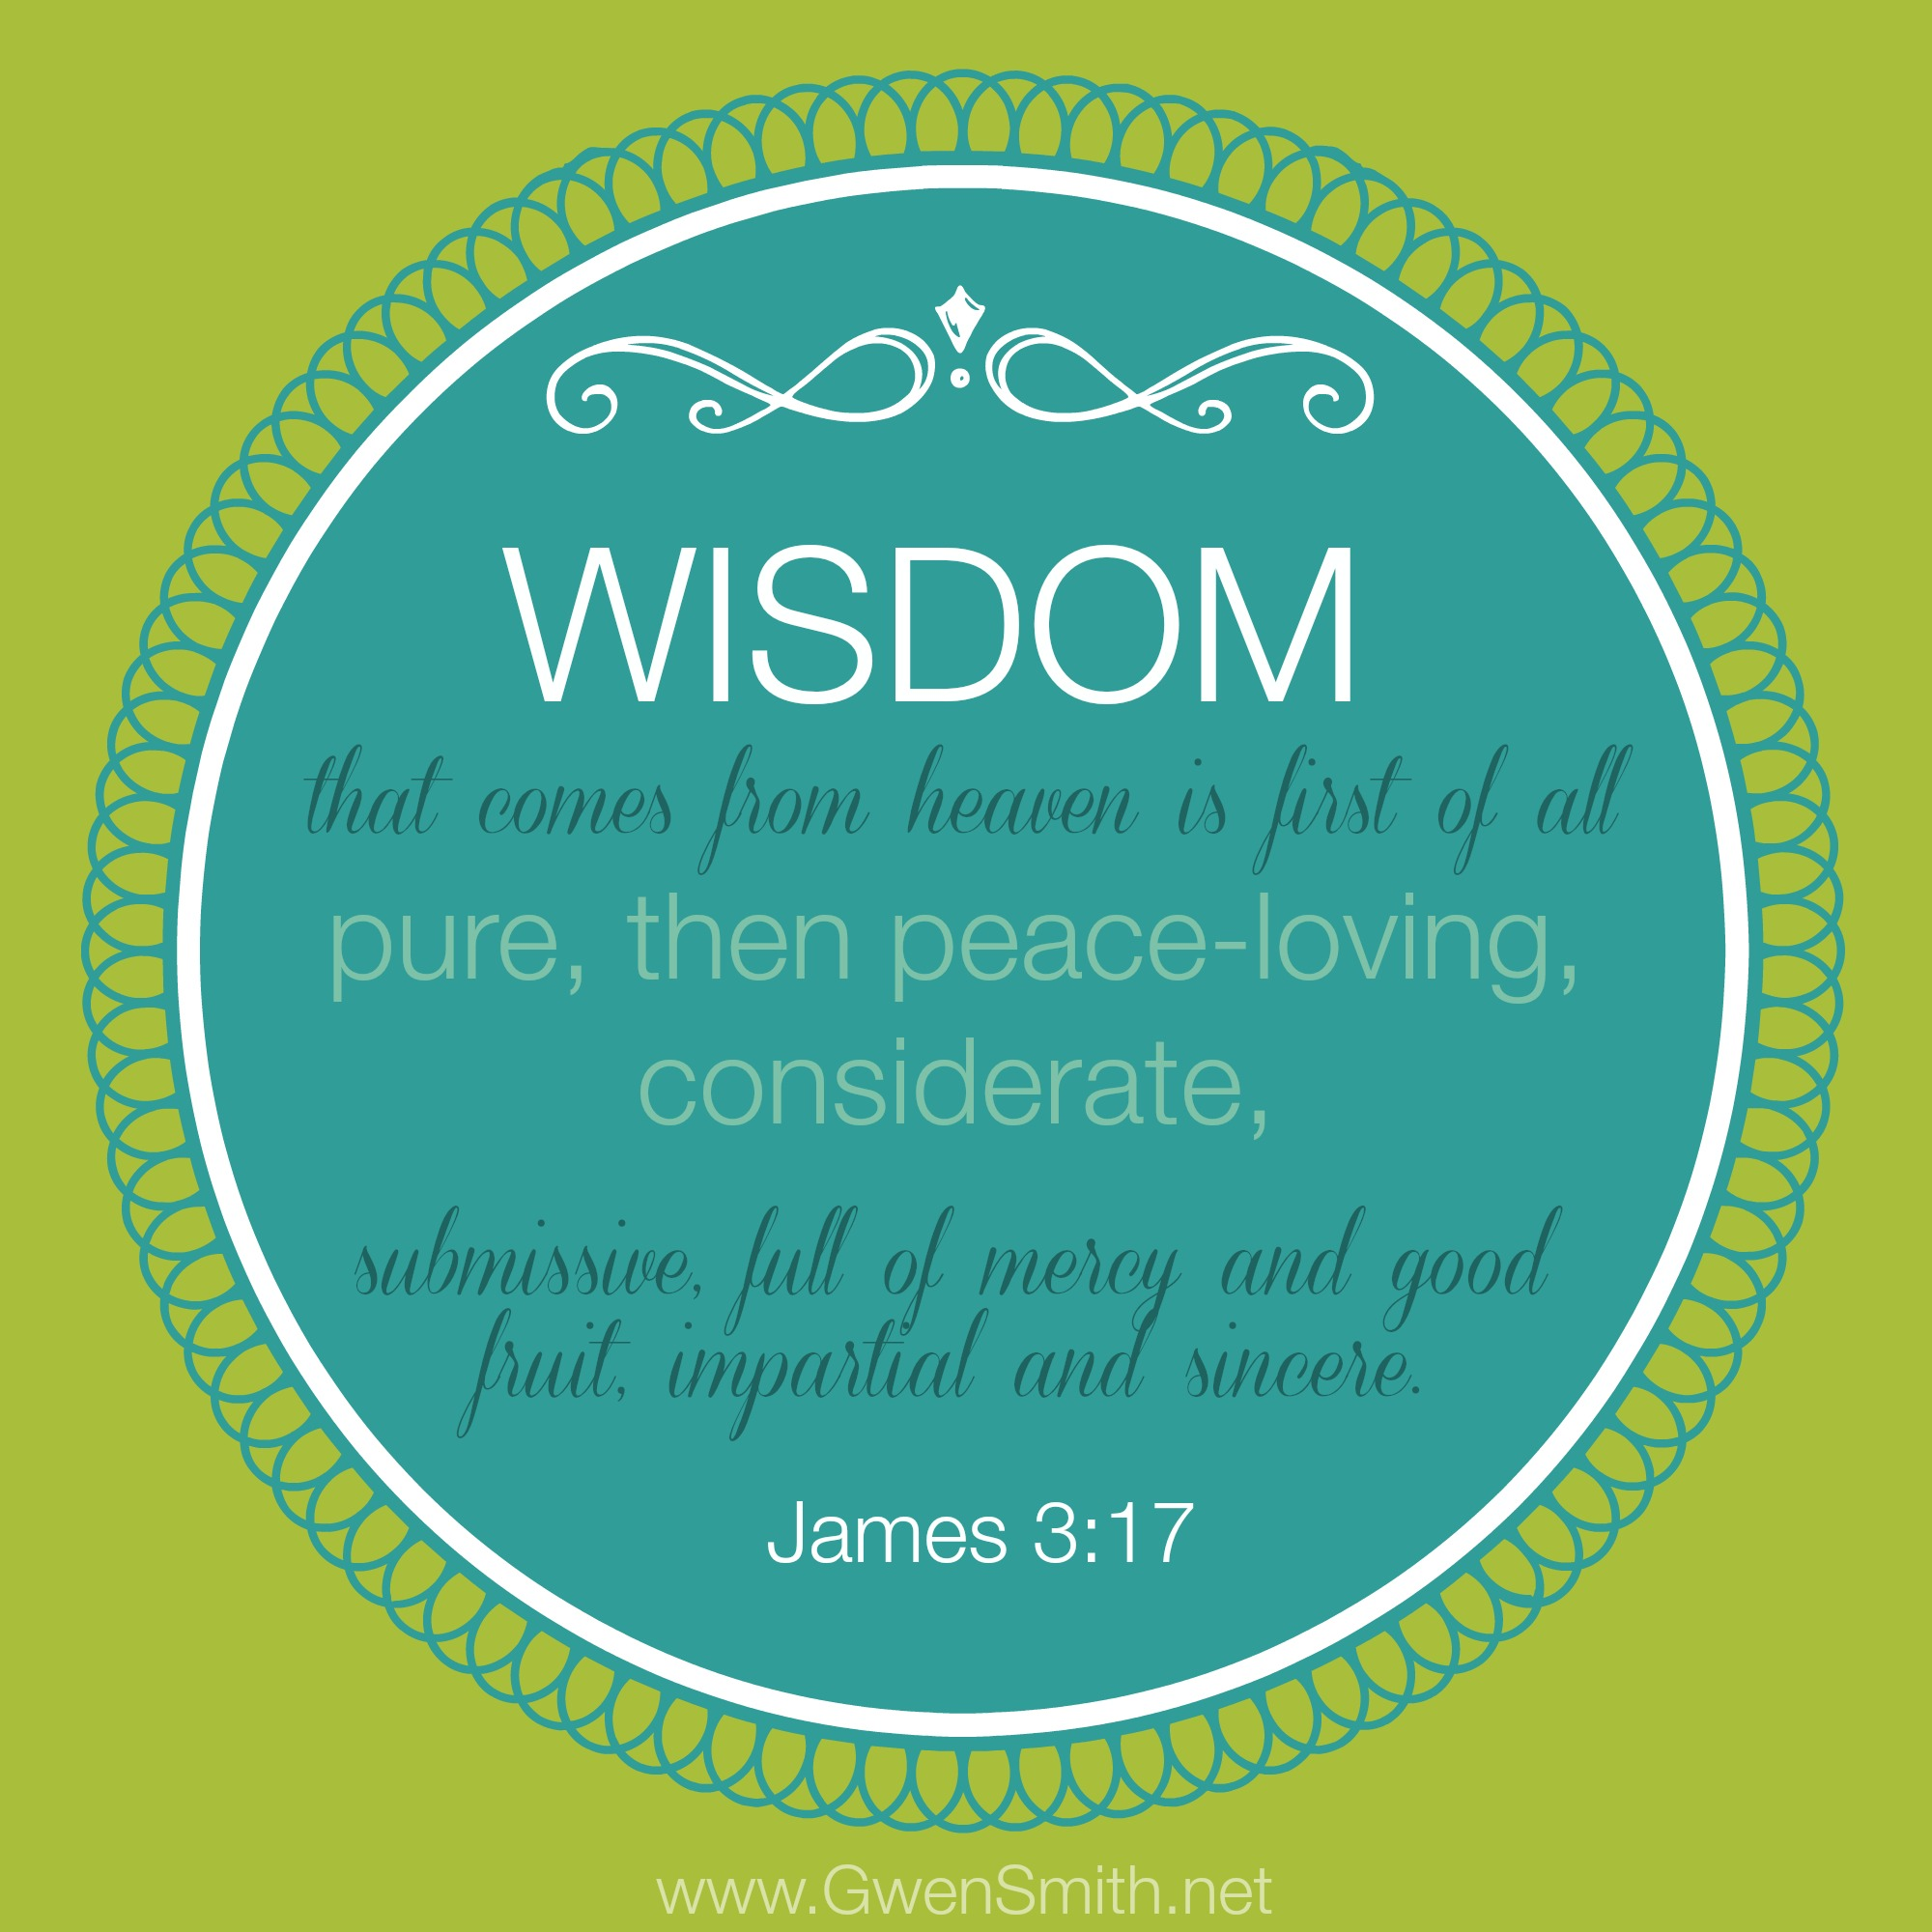 james 3.17 wisdom